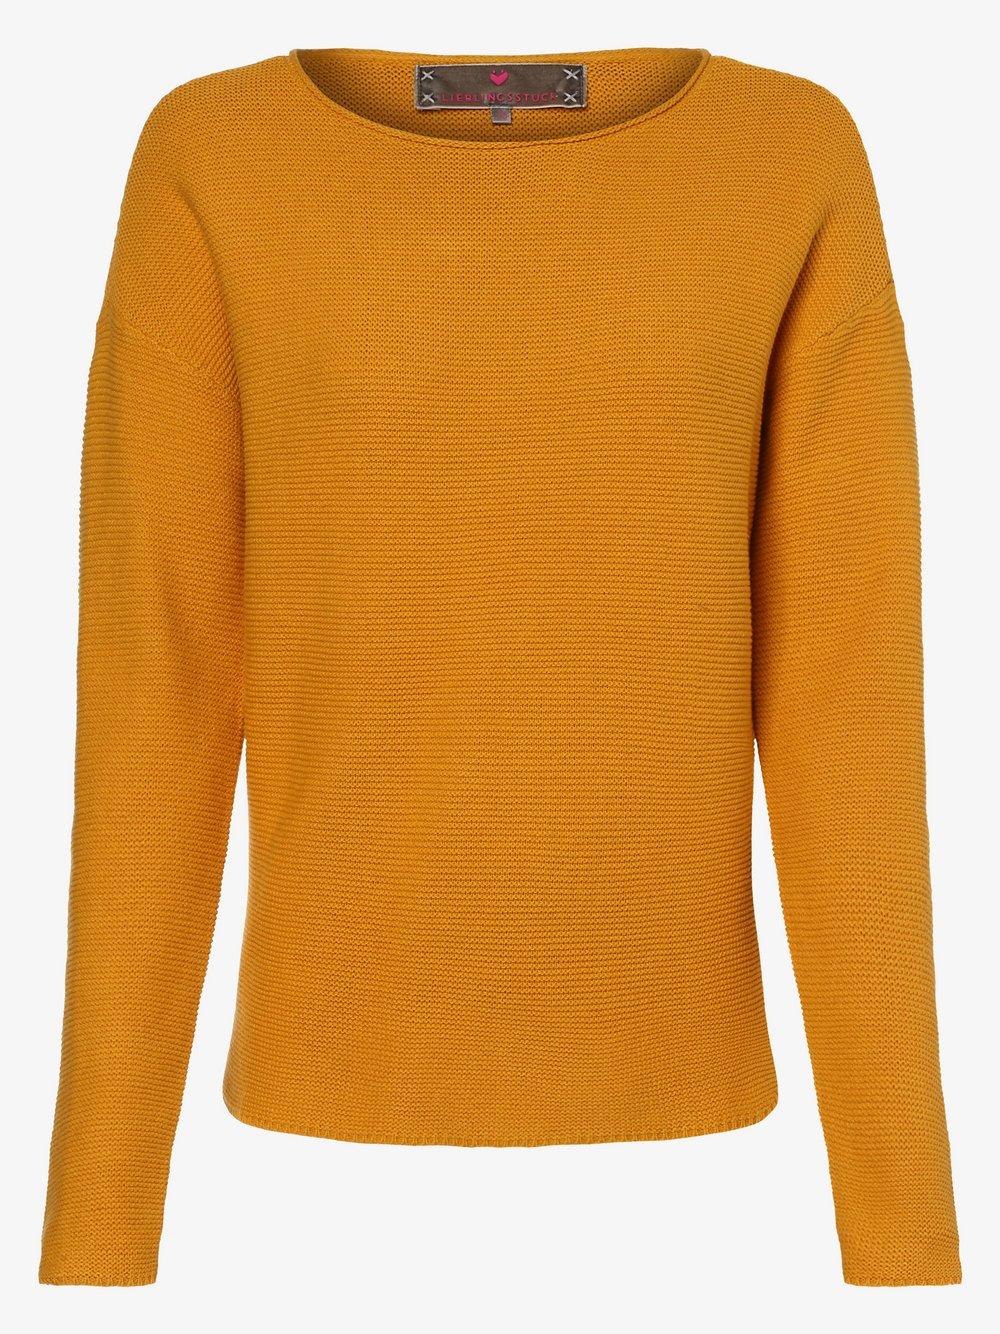 Lieblingsstück – Sweter damski – AnnikaL, żółty Van Graaf 457272-0002-00460